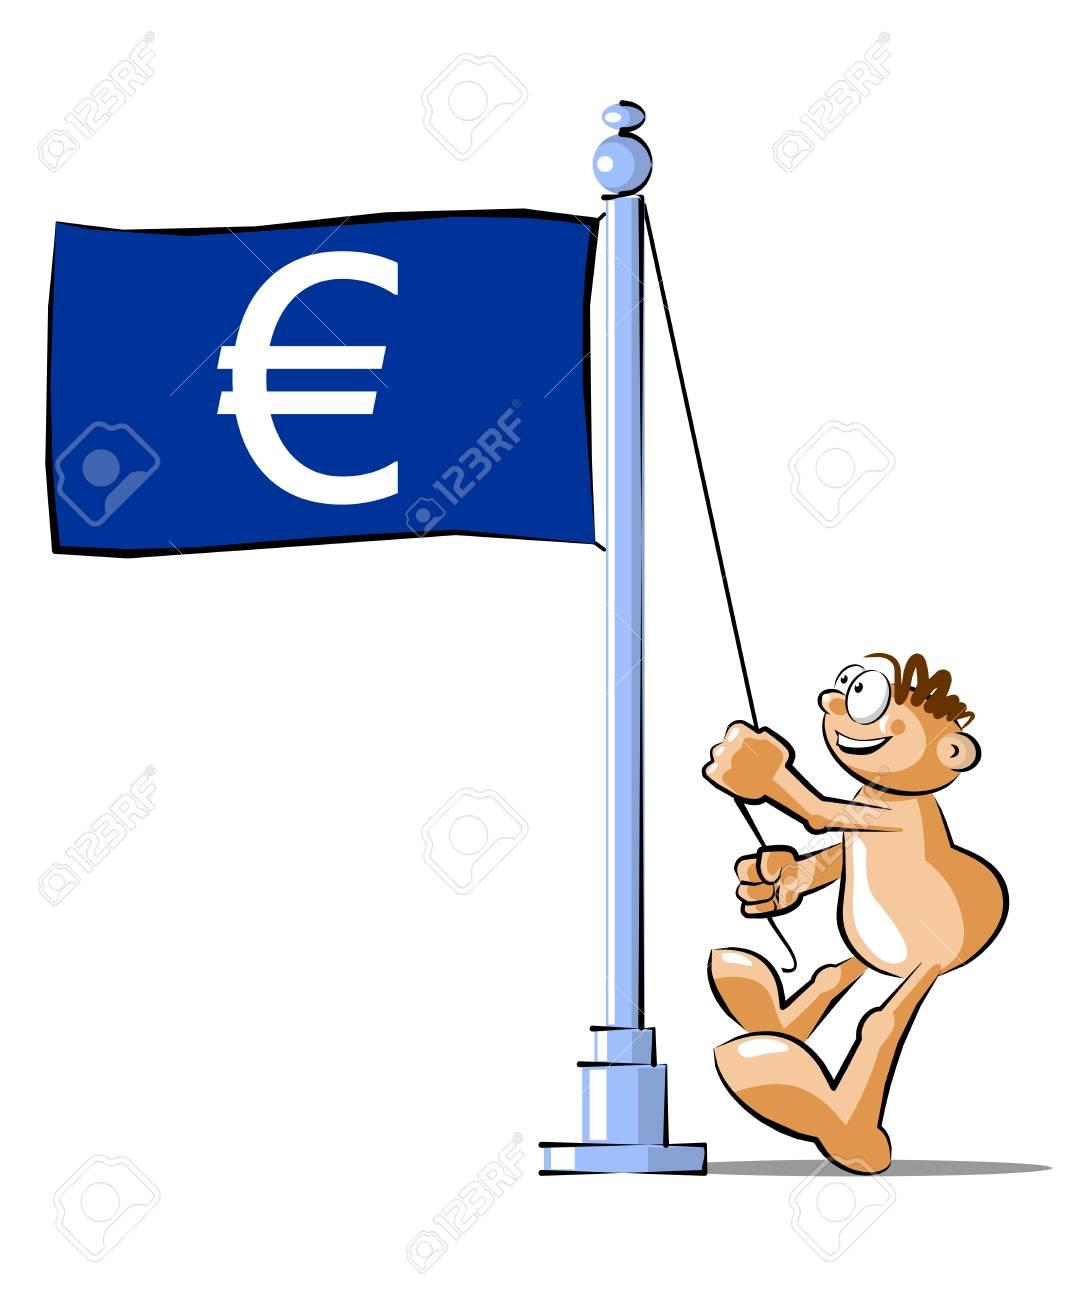 Funny Cartoon Raising A Flag With Euro Sign Conceptual Illustration